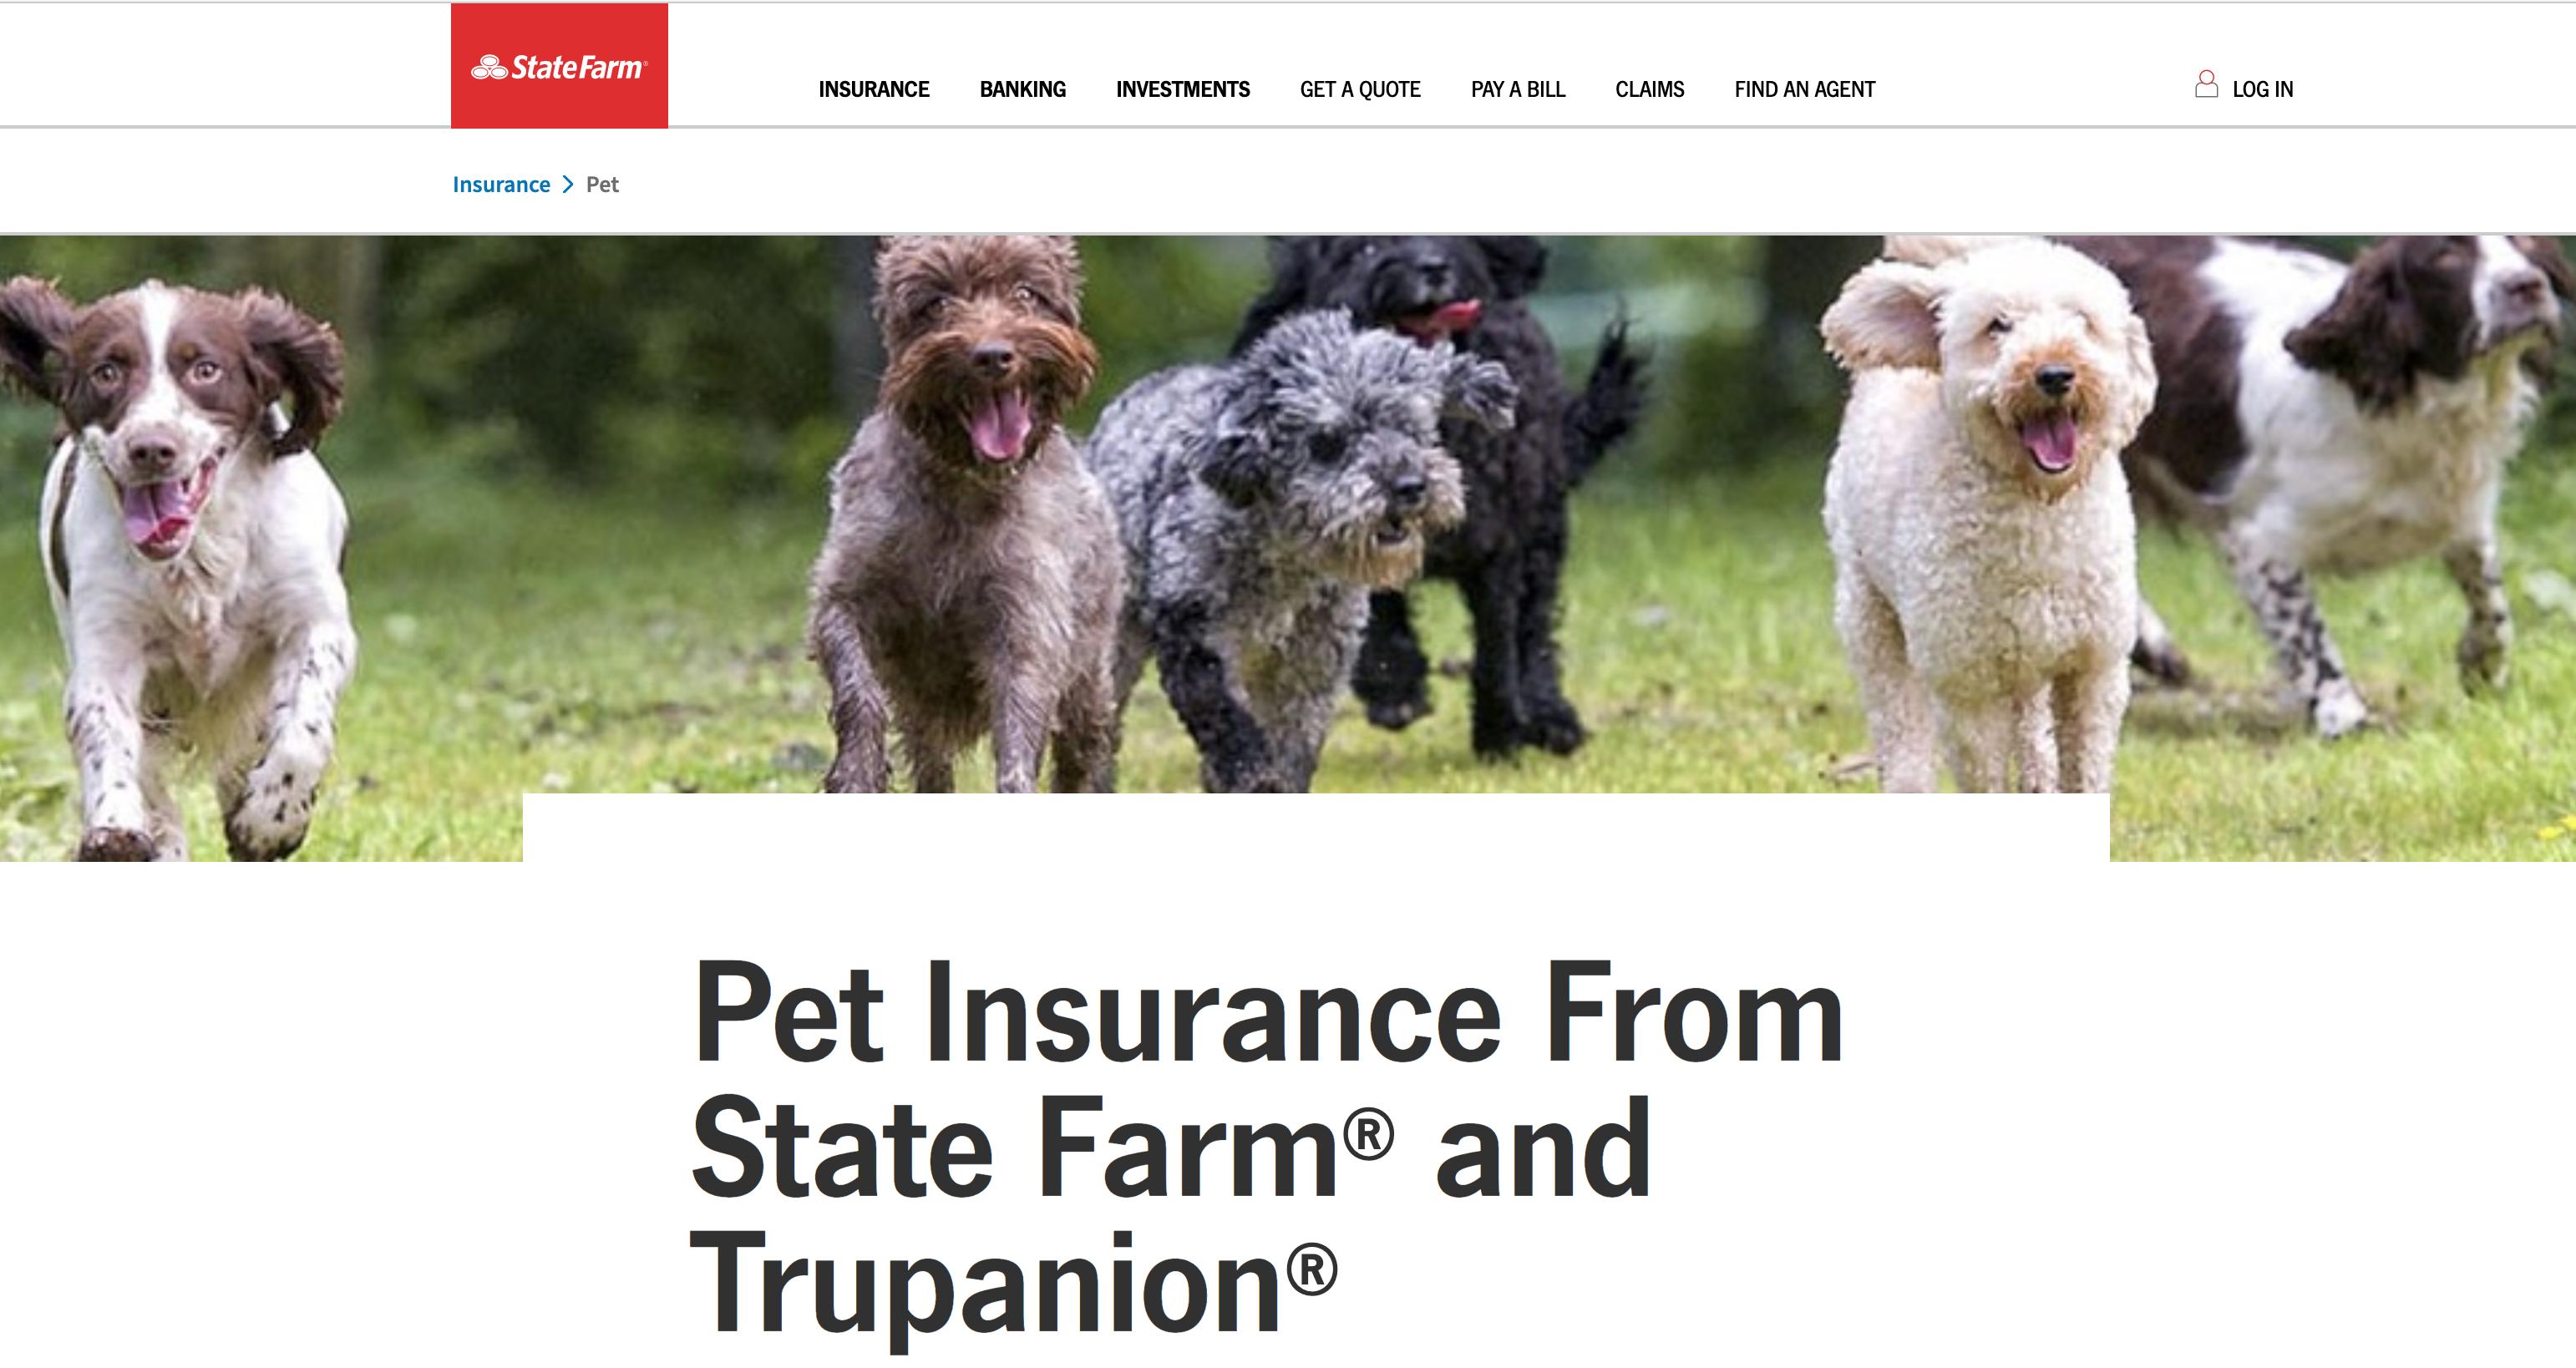 State Farm And Trupanion Expand Partnership